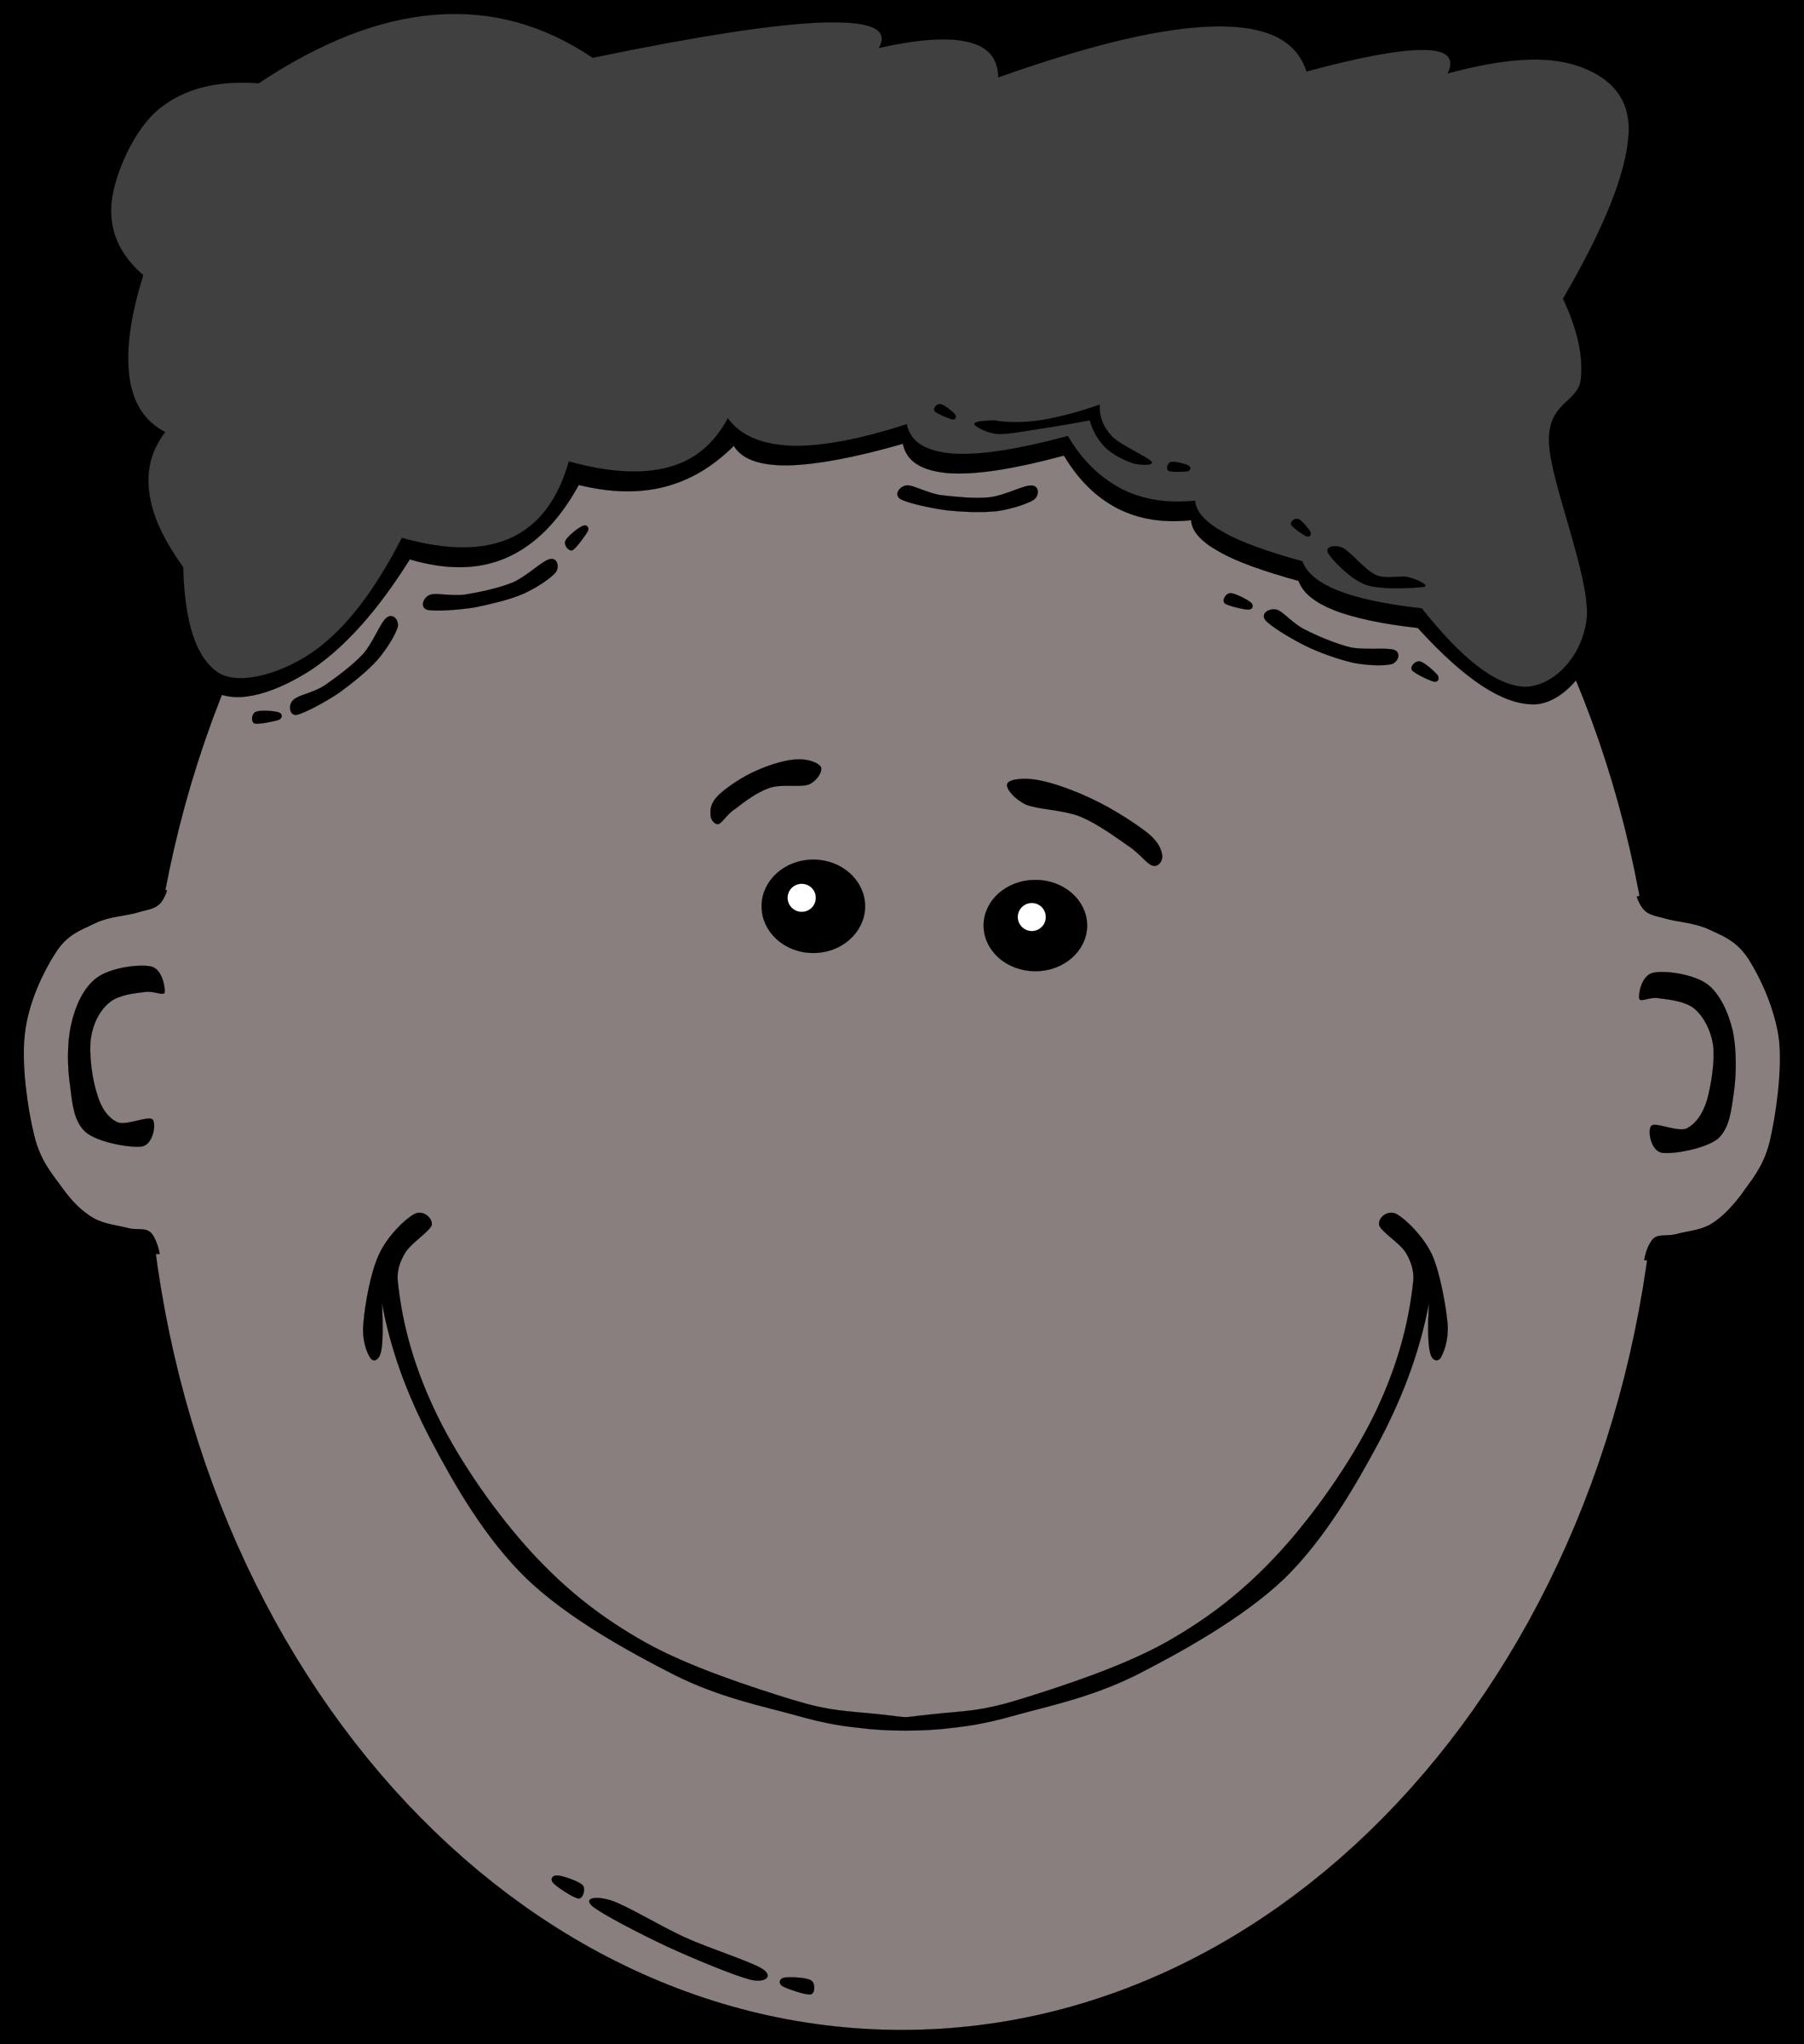 Clipart face children's. Boy cartoon big image